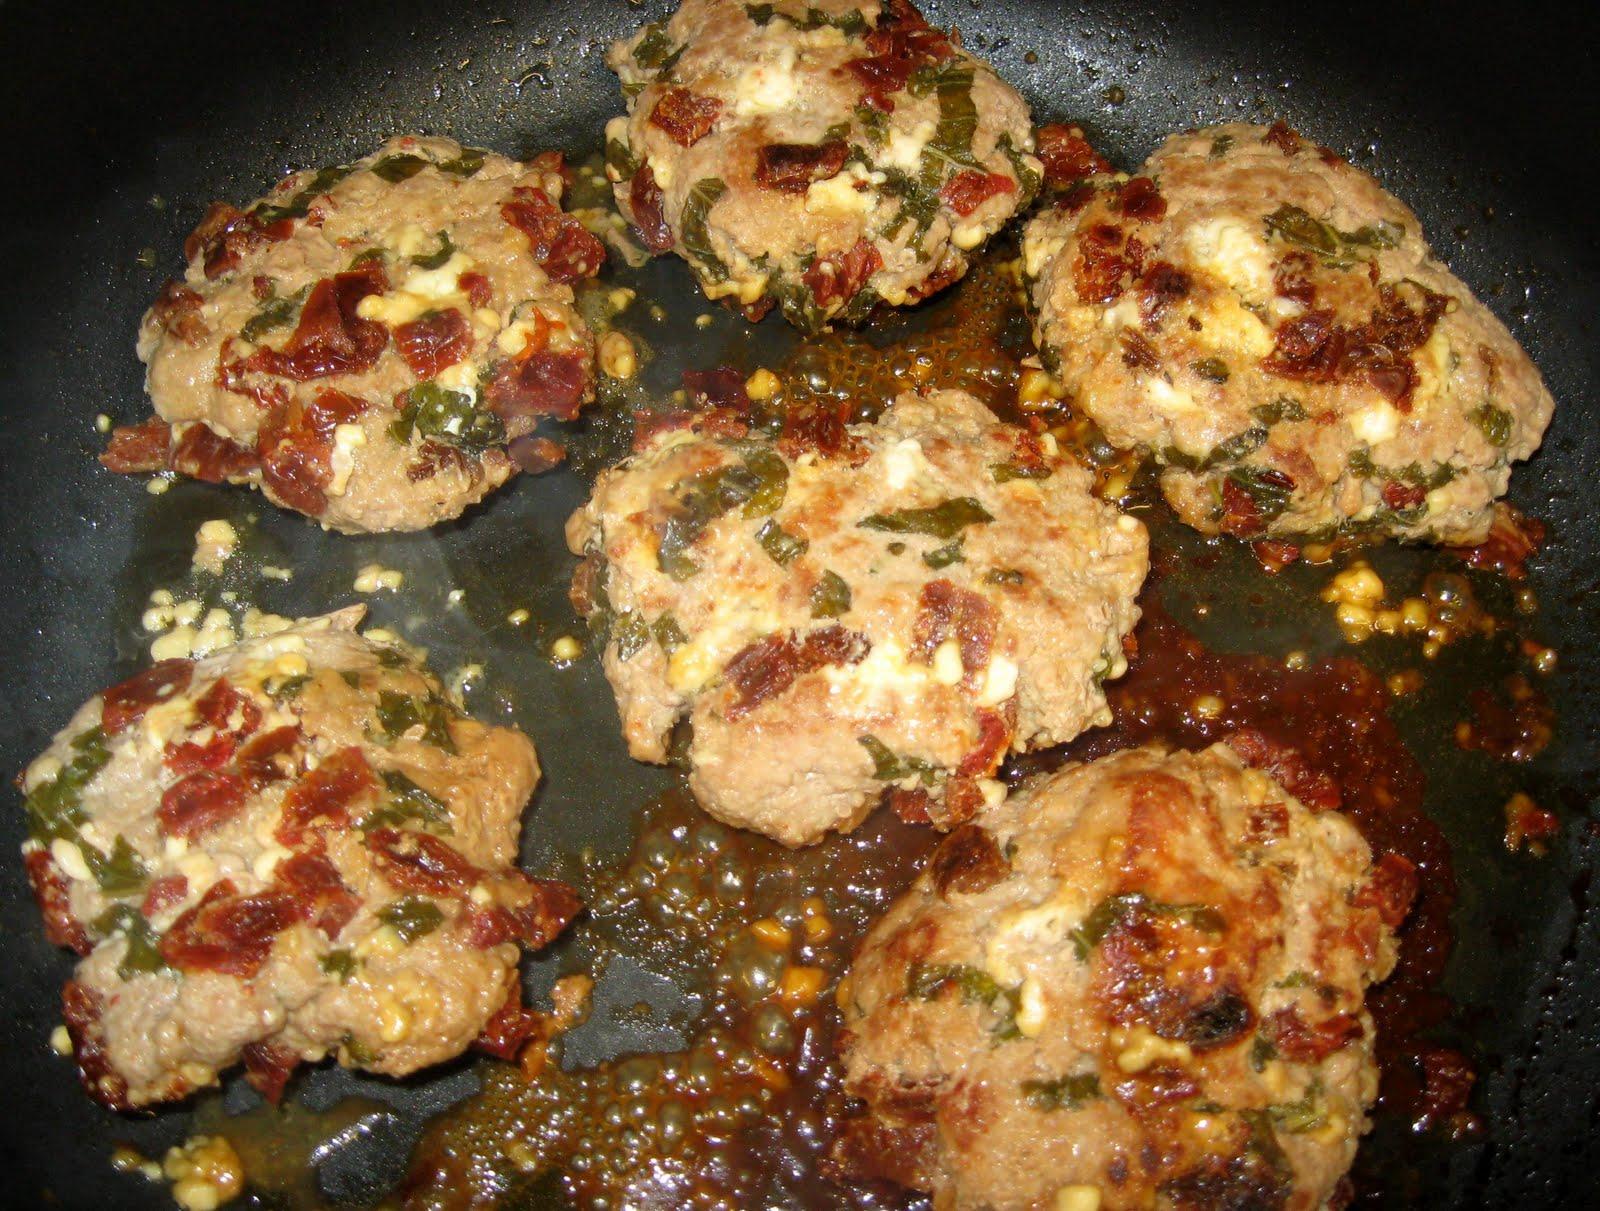 ... Healthy & Low Calorie: Sun Dried Tomato, Basil, Feta Cheese Burgers